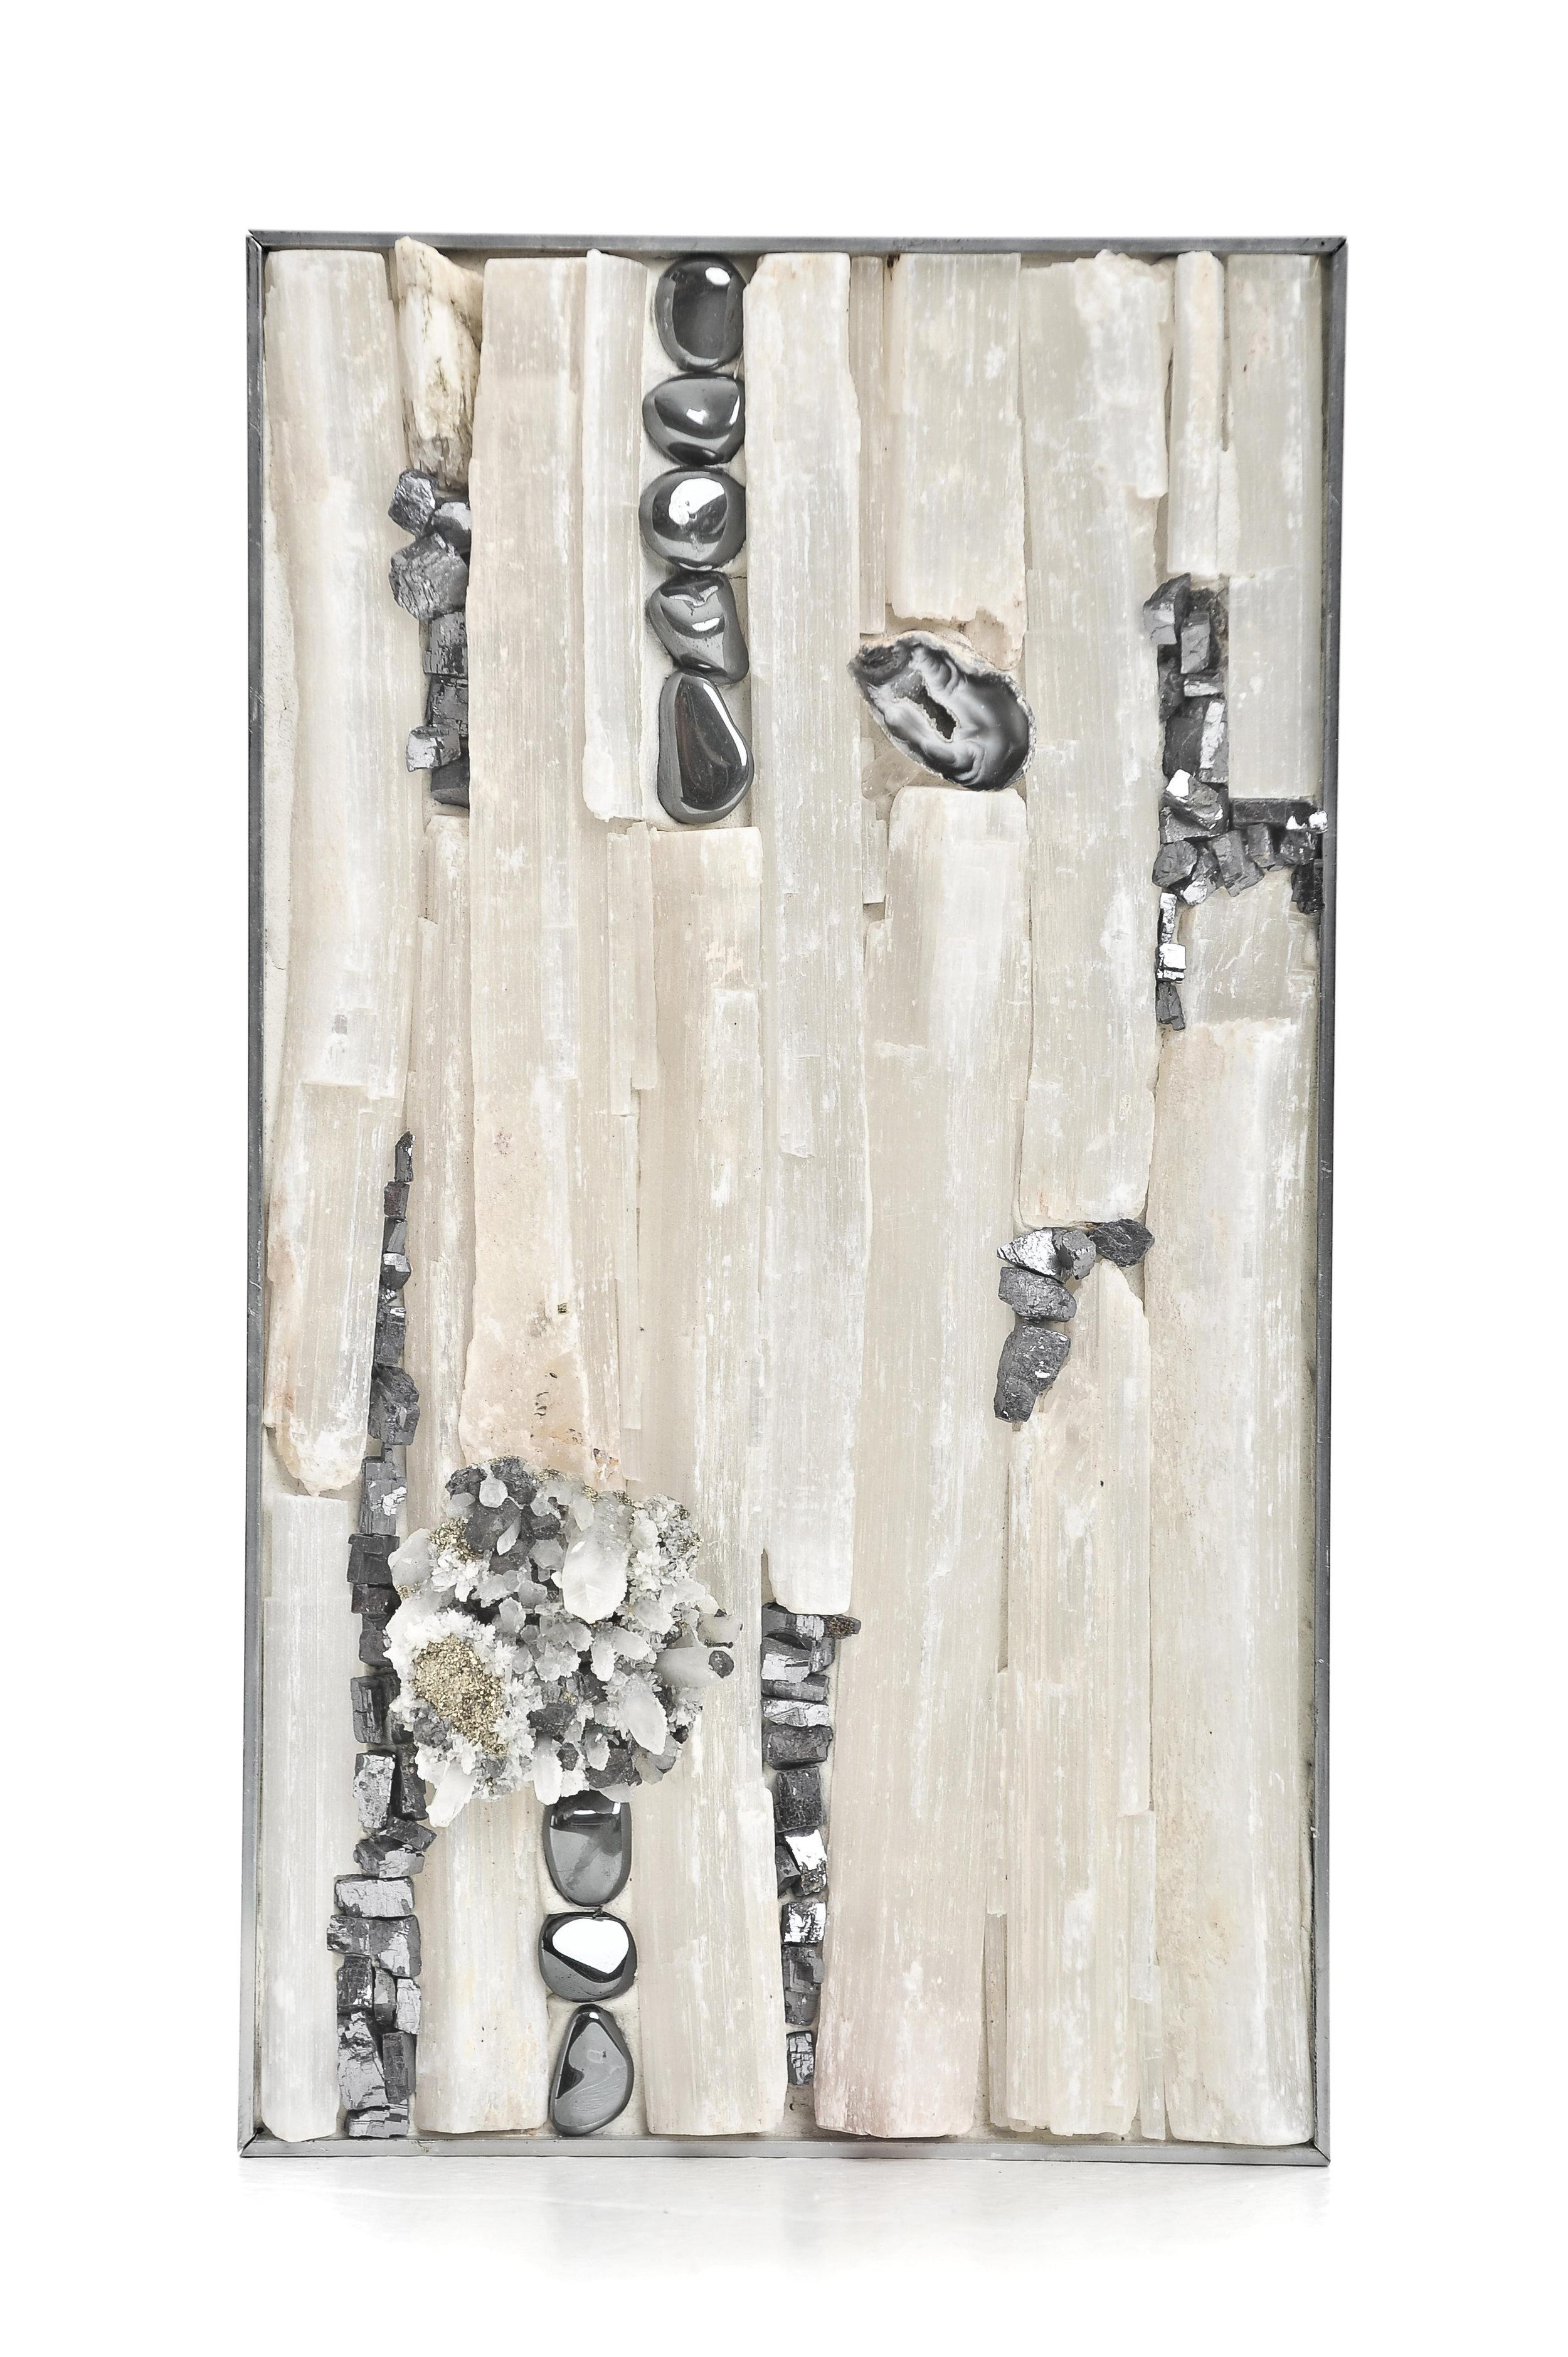 Sticks and Stones DSC_3416.JPG